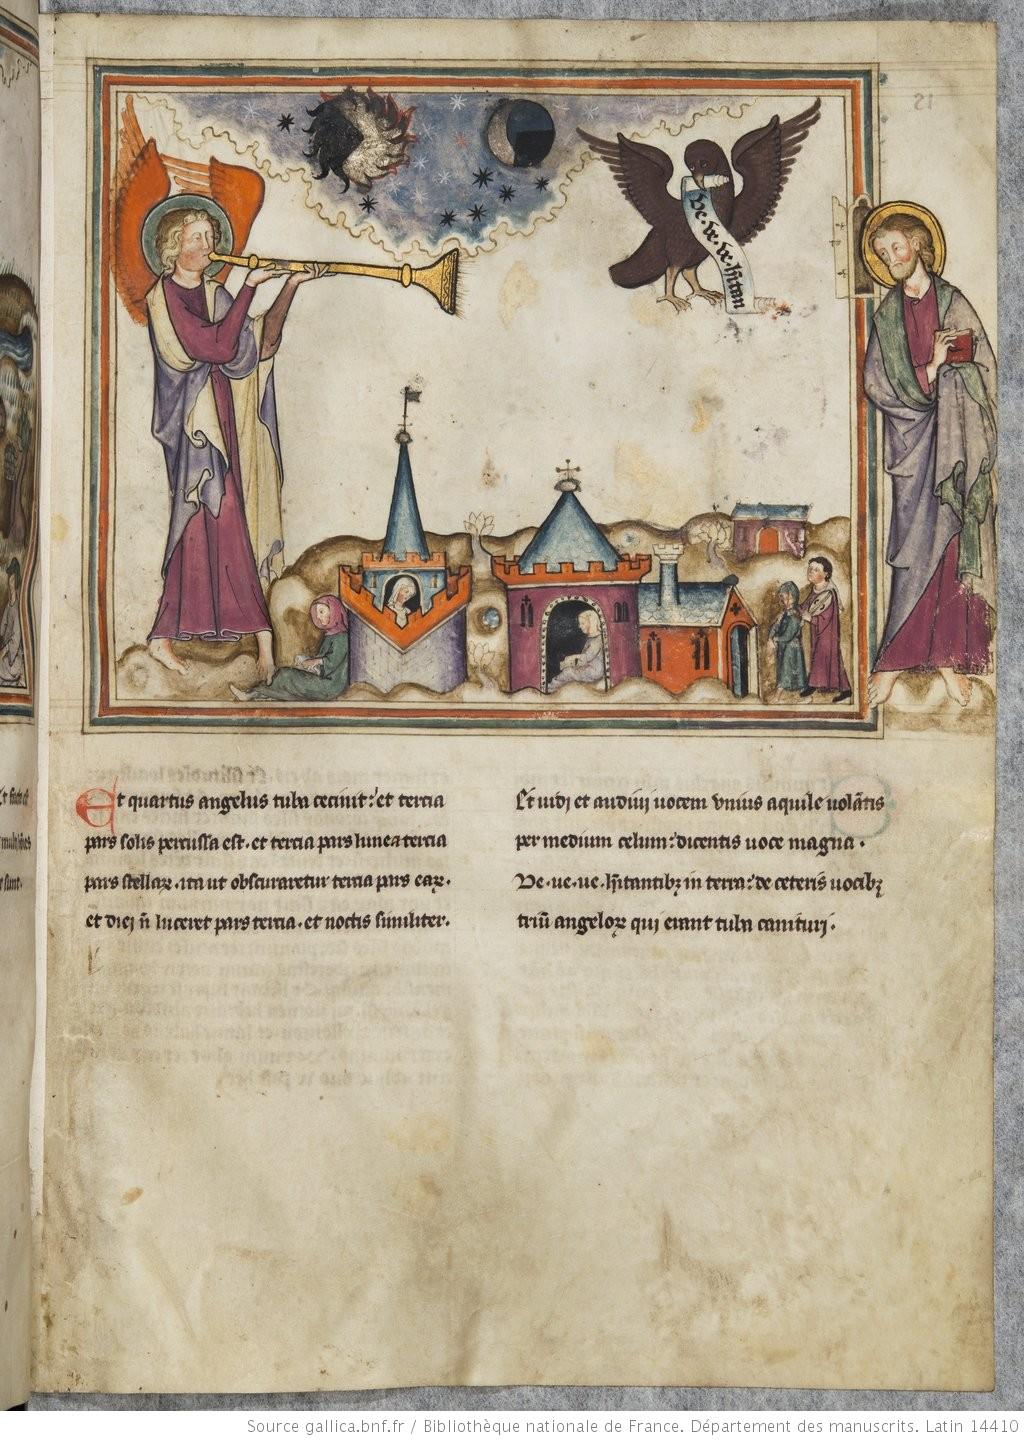 1275-1300 BNF Lat 14410 fol 21